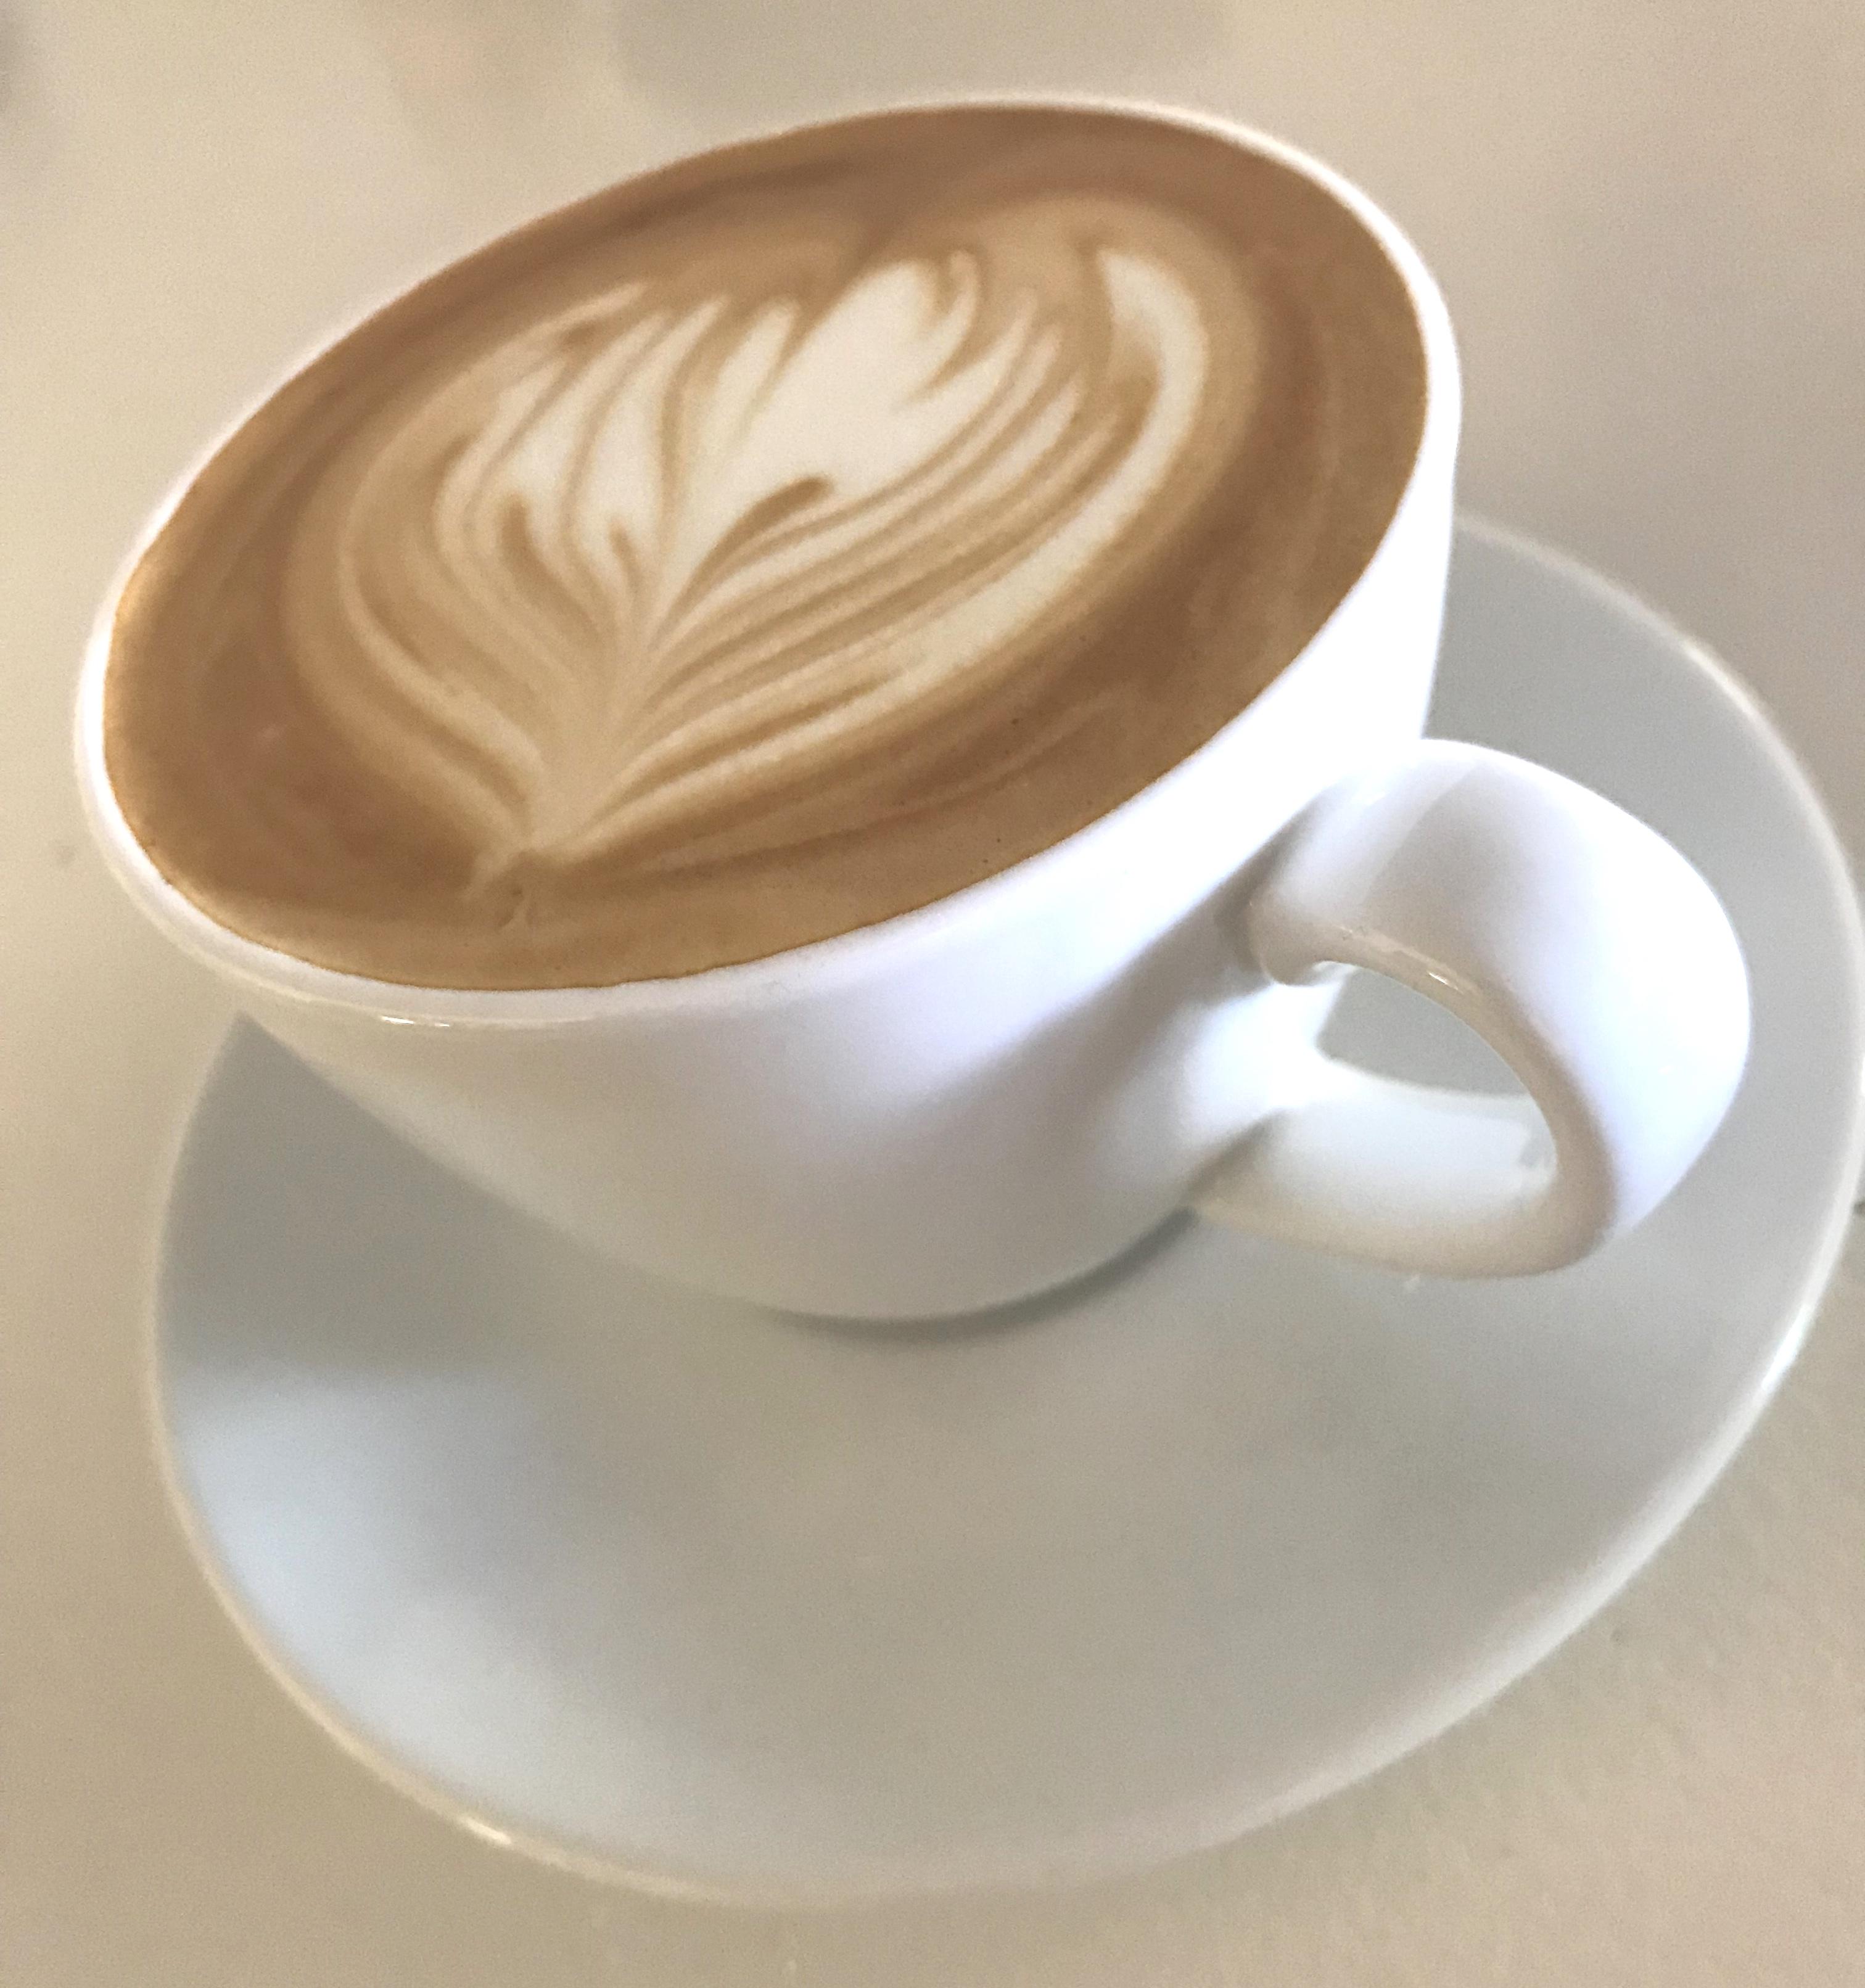 The Humble Cappuccino